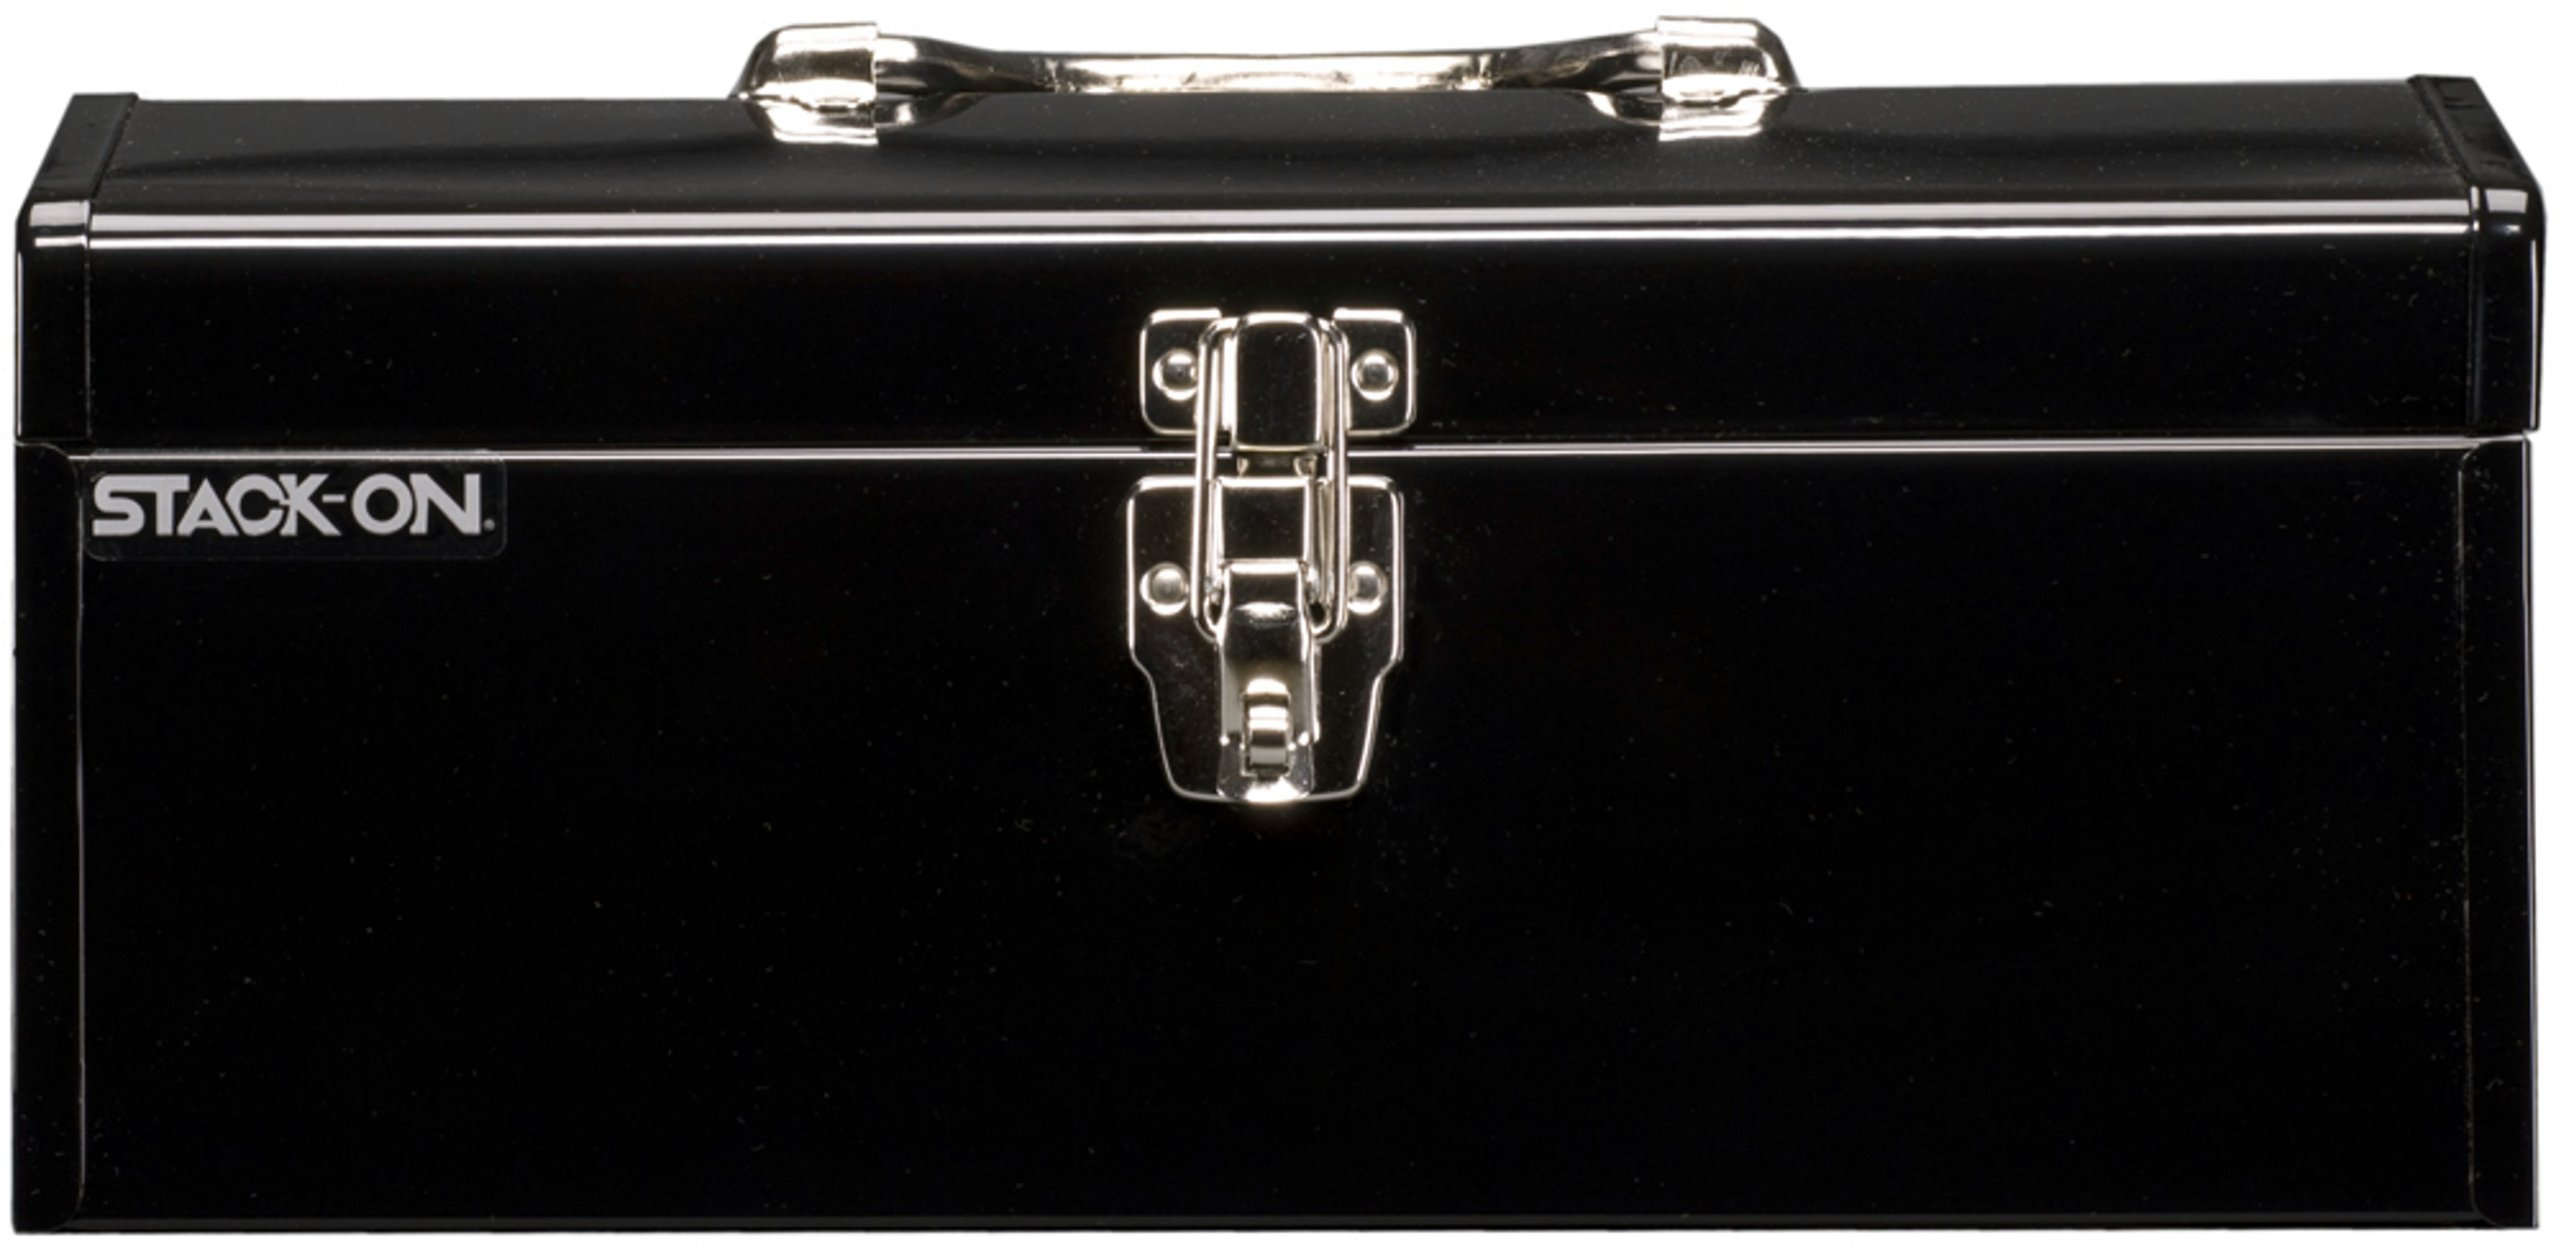 Stack-On SHB-16 16-Inch Multi-Purpose Steel Tool Box, Black